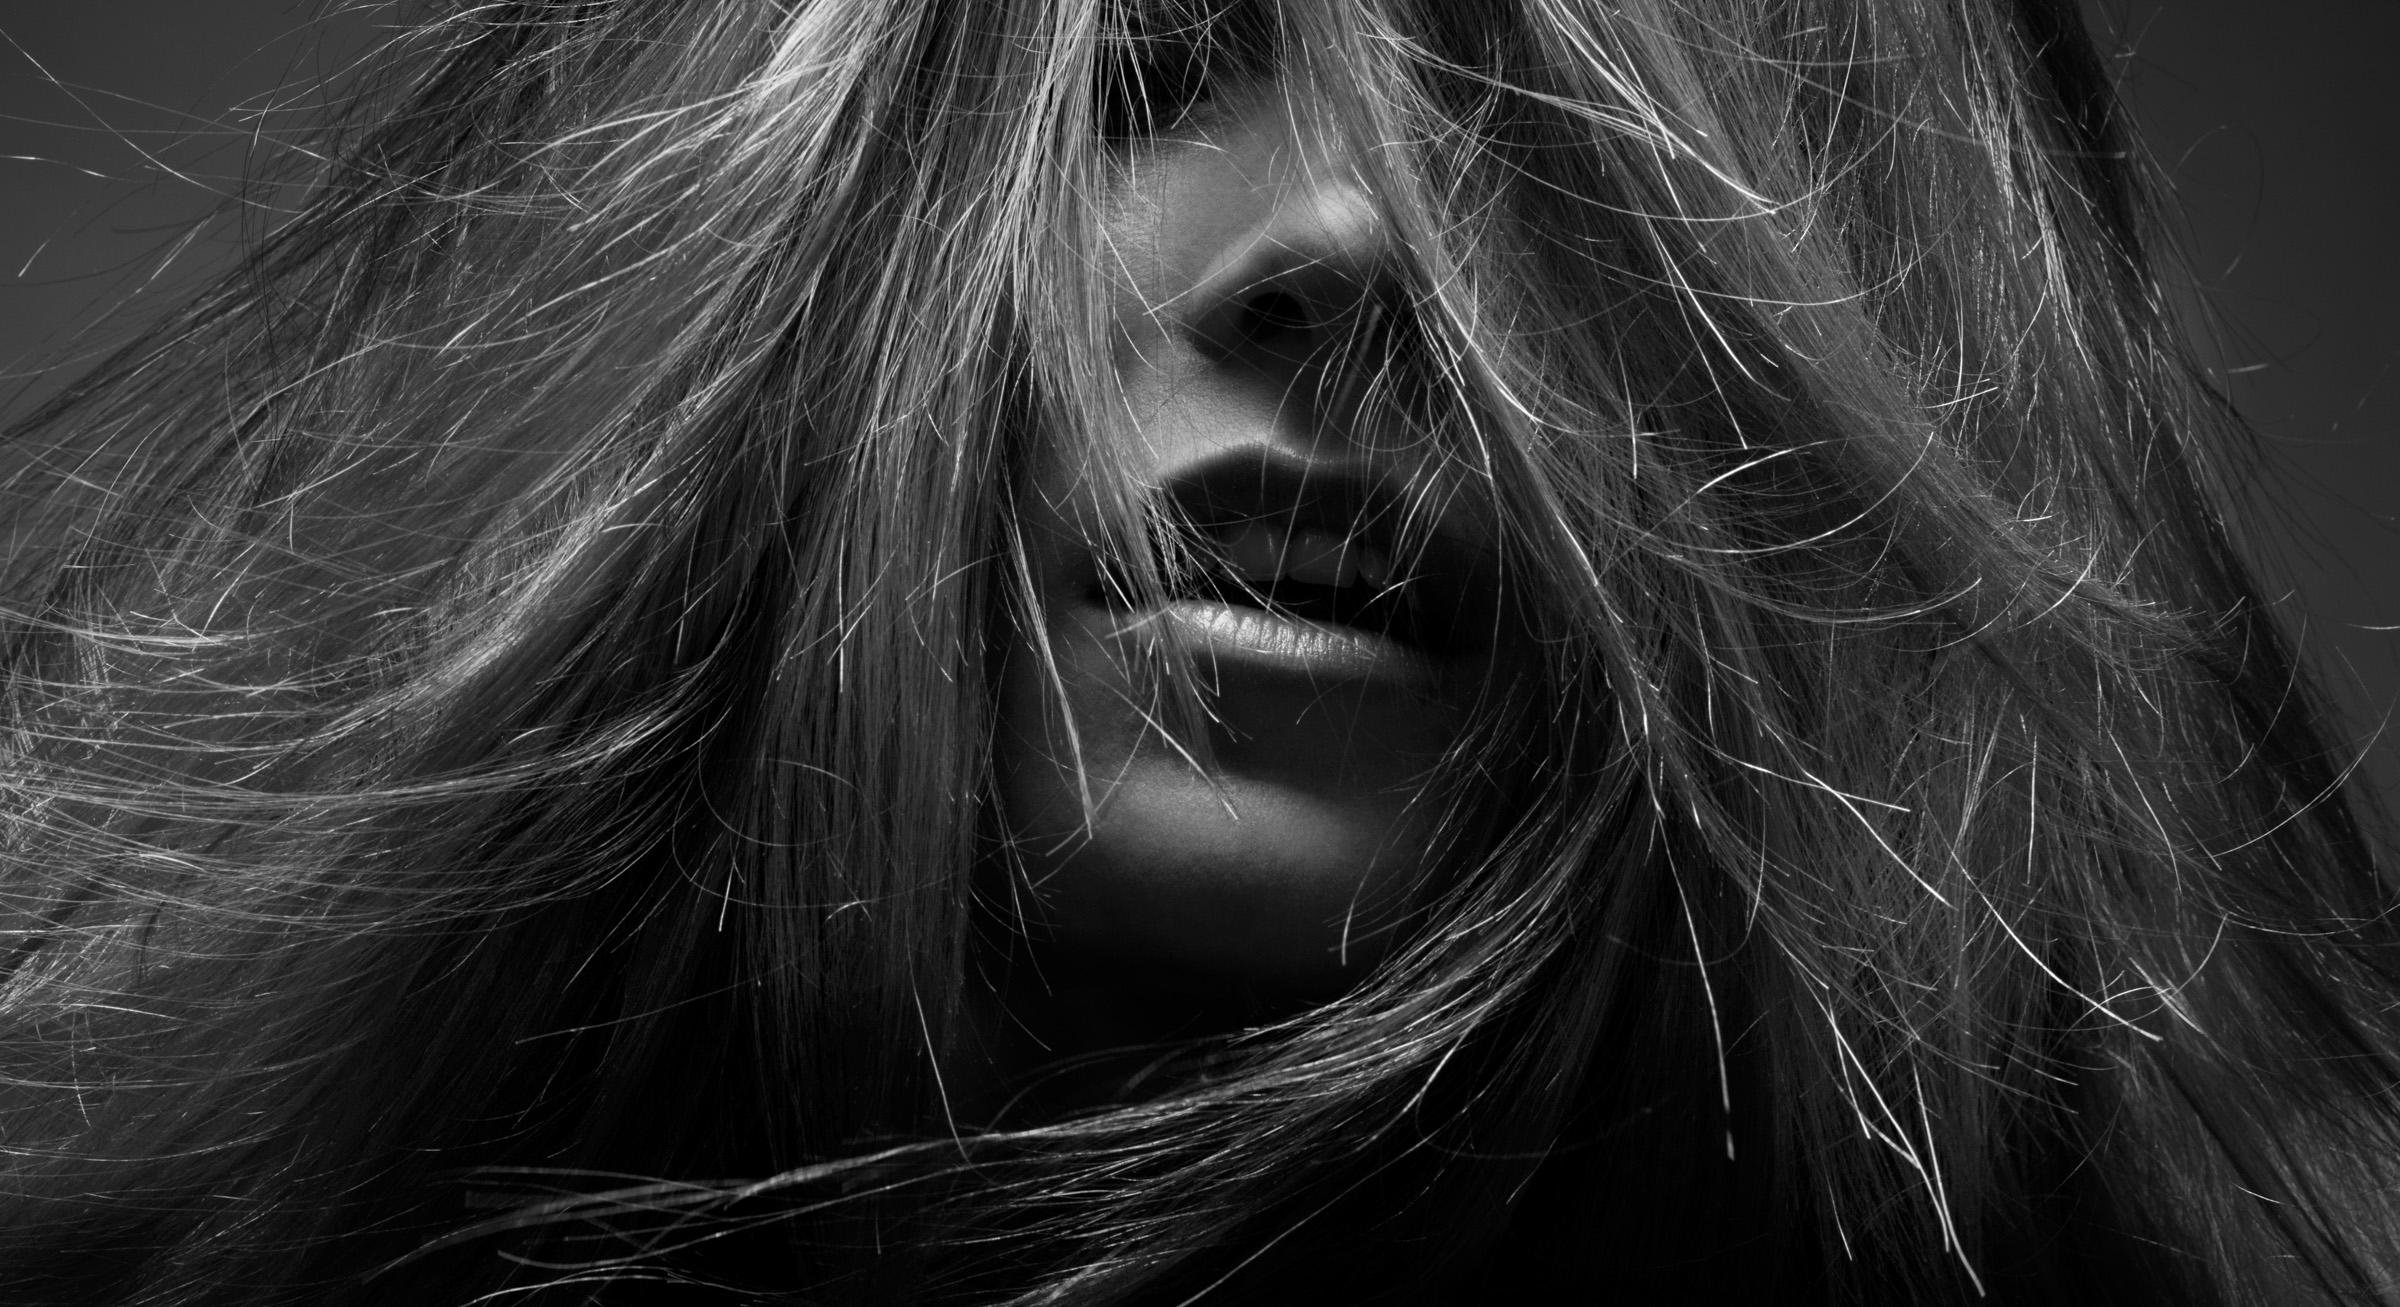 Jack_Eames_Andrew_Barton_Black_White_Hair_Beauty_Photographer_London_01.jpg